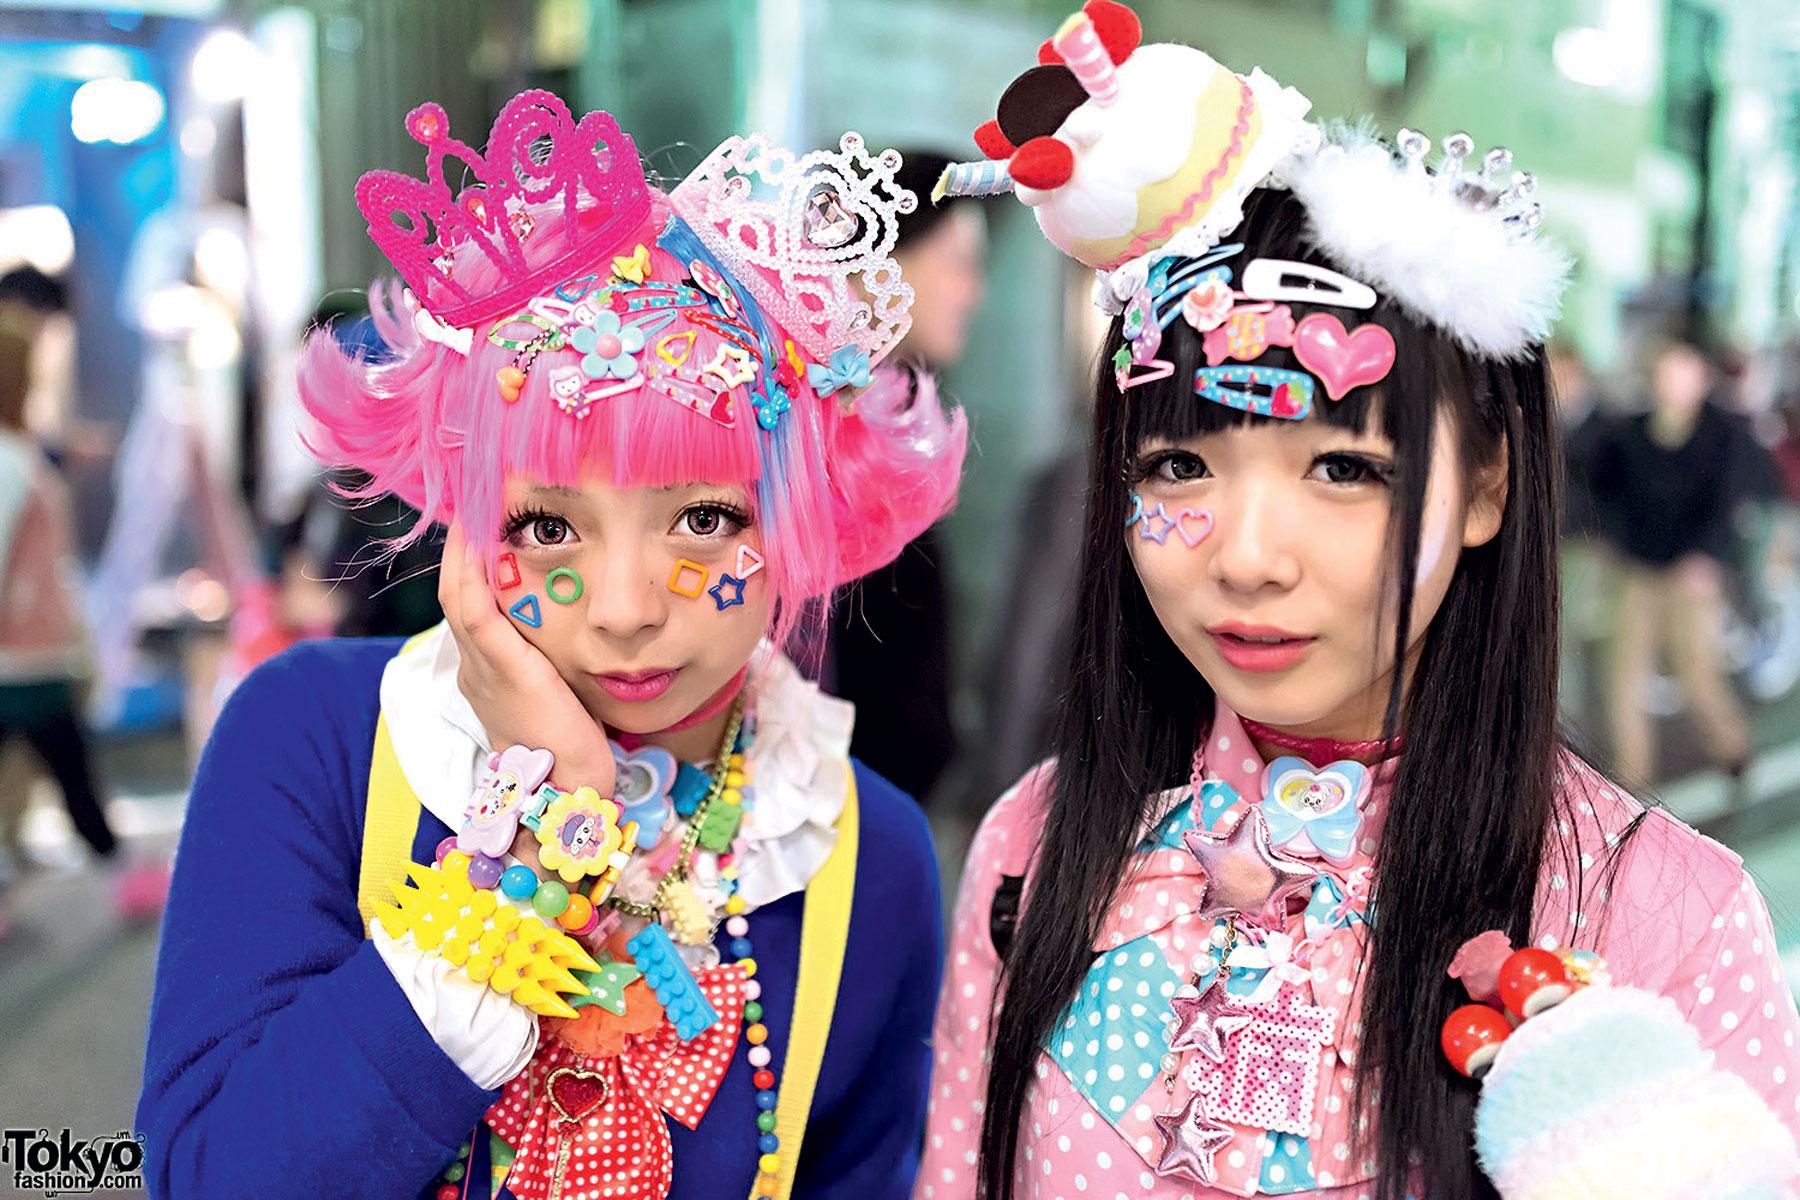 decora-girls-of-japan-net-flix-best-erotic-romantic-movie